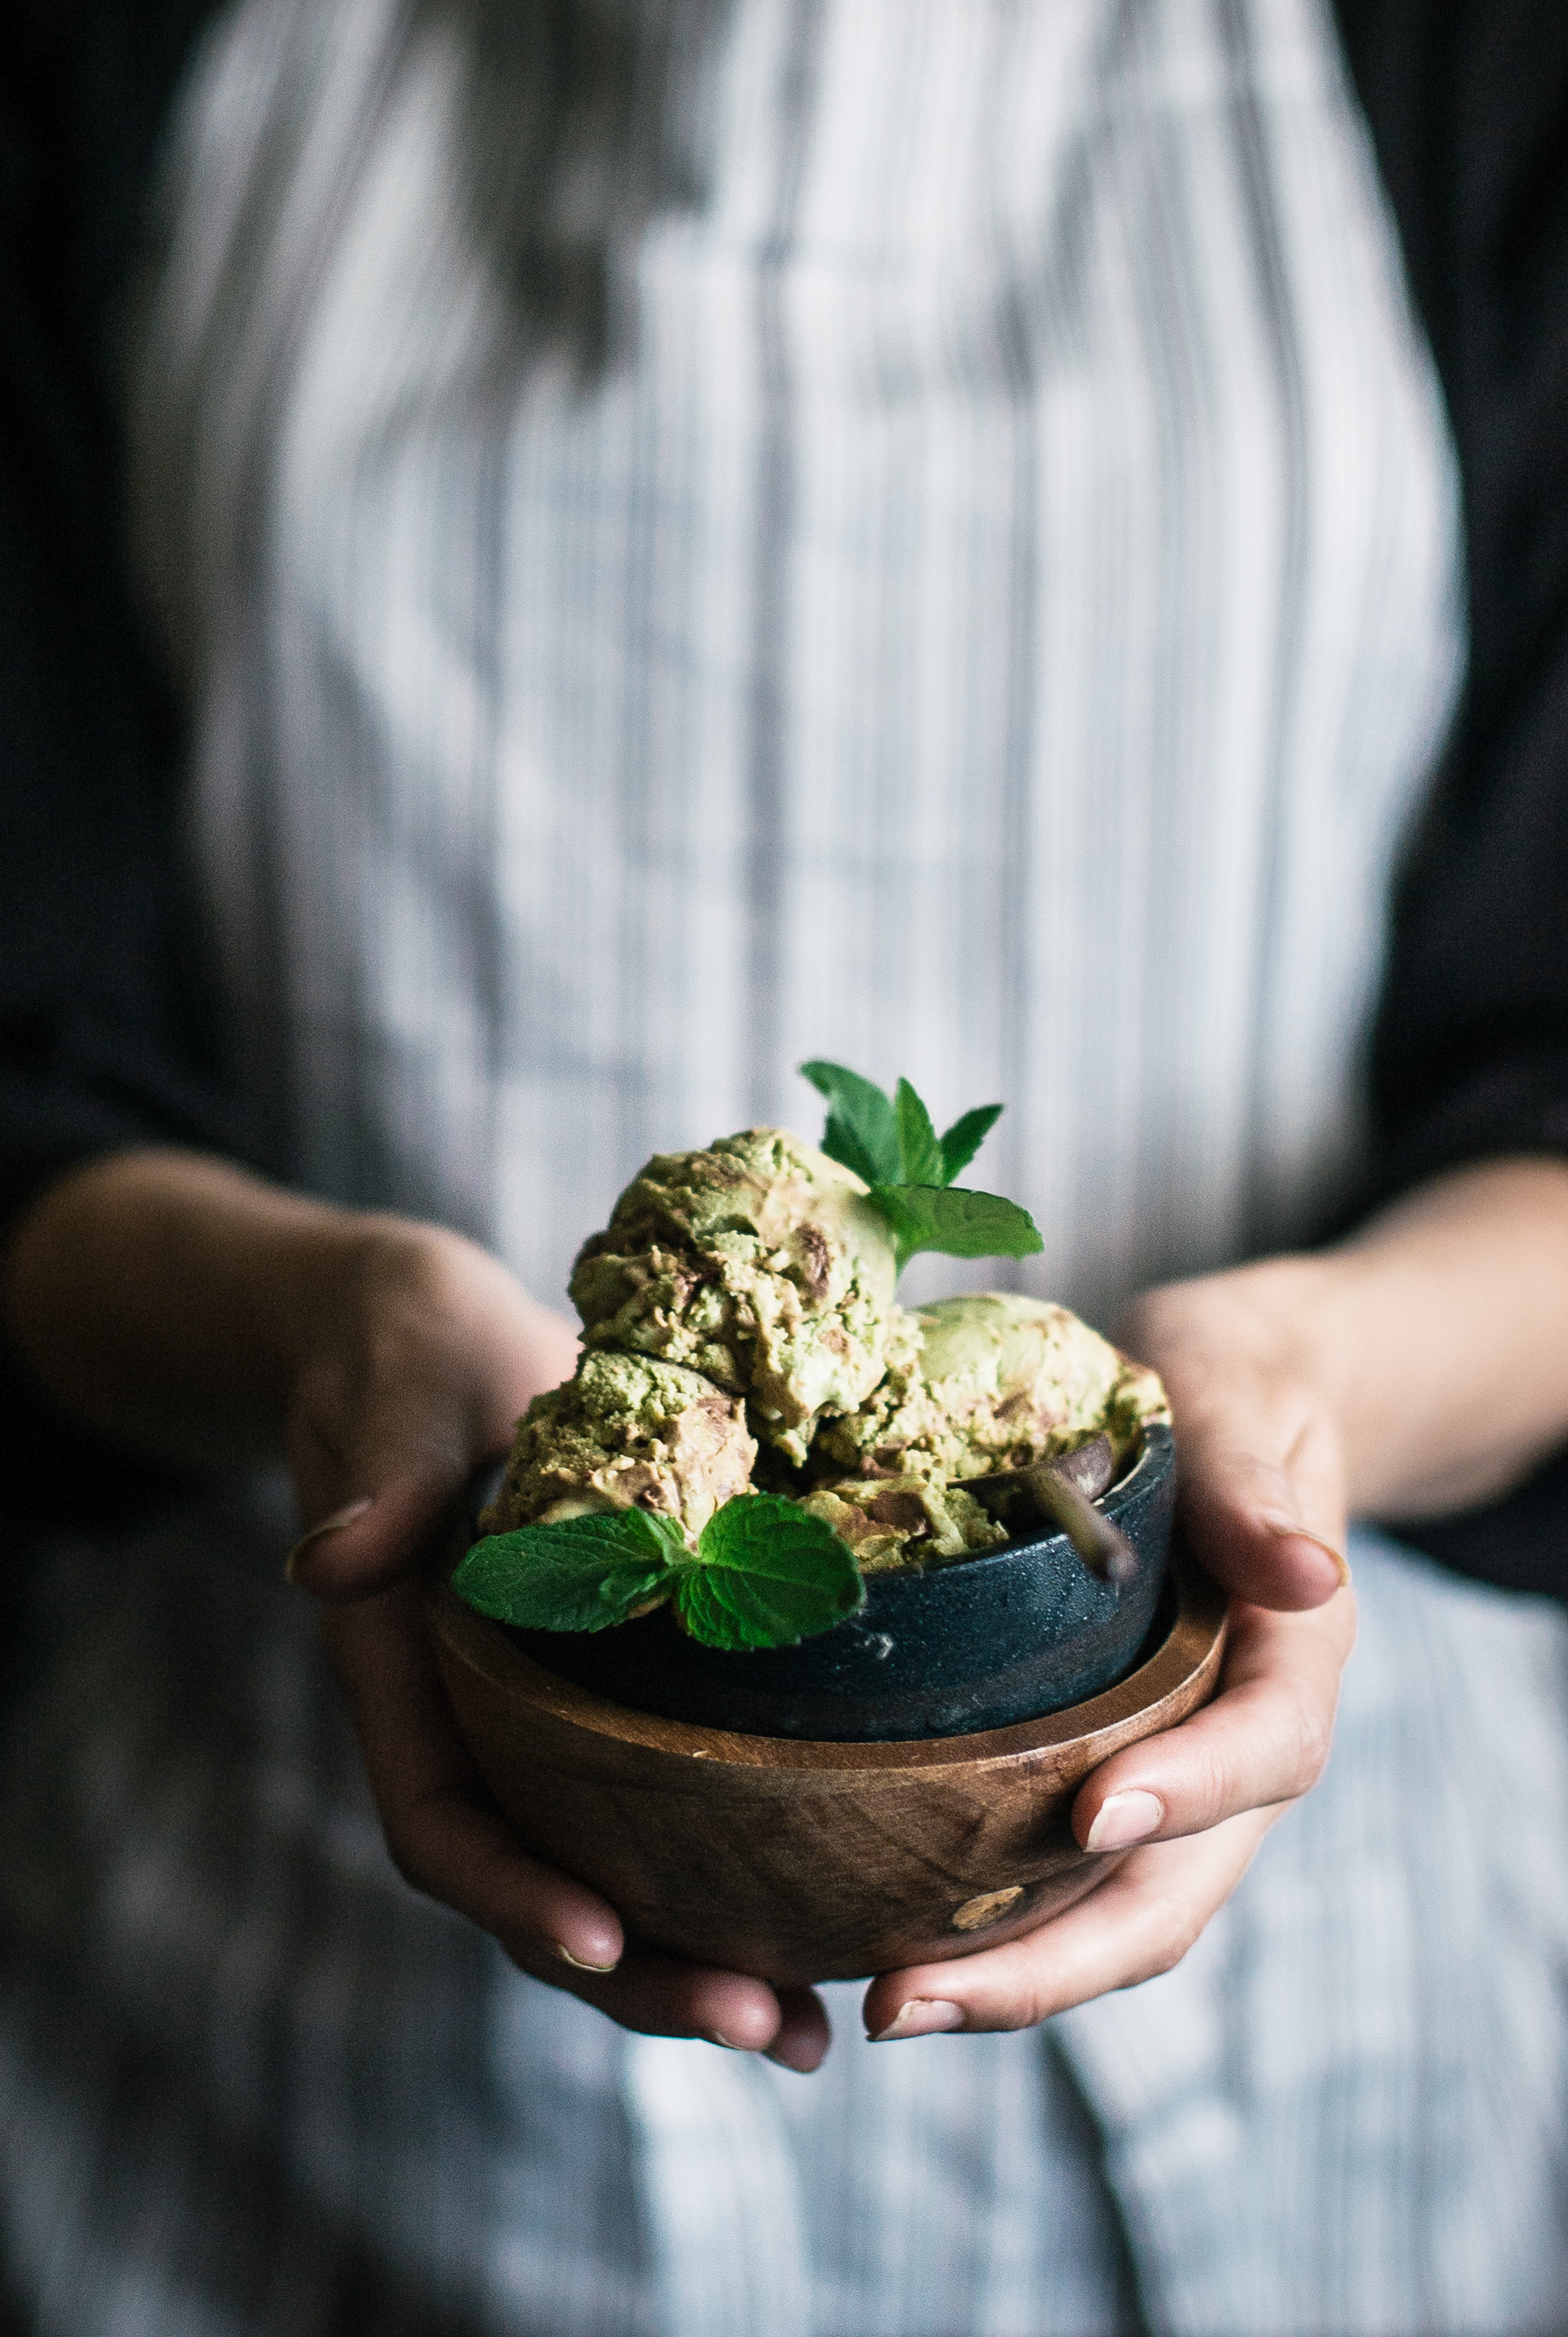 Matcha Avocado Mint Chocolate Mousse Swirl Ice Cream - The Kitchen ...